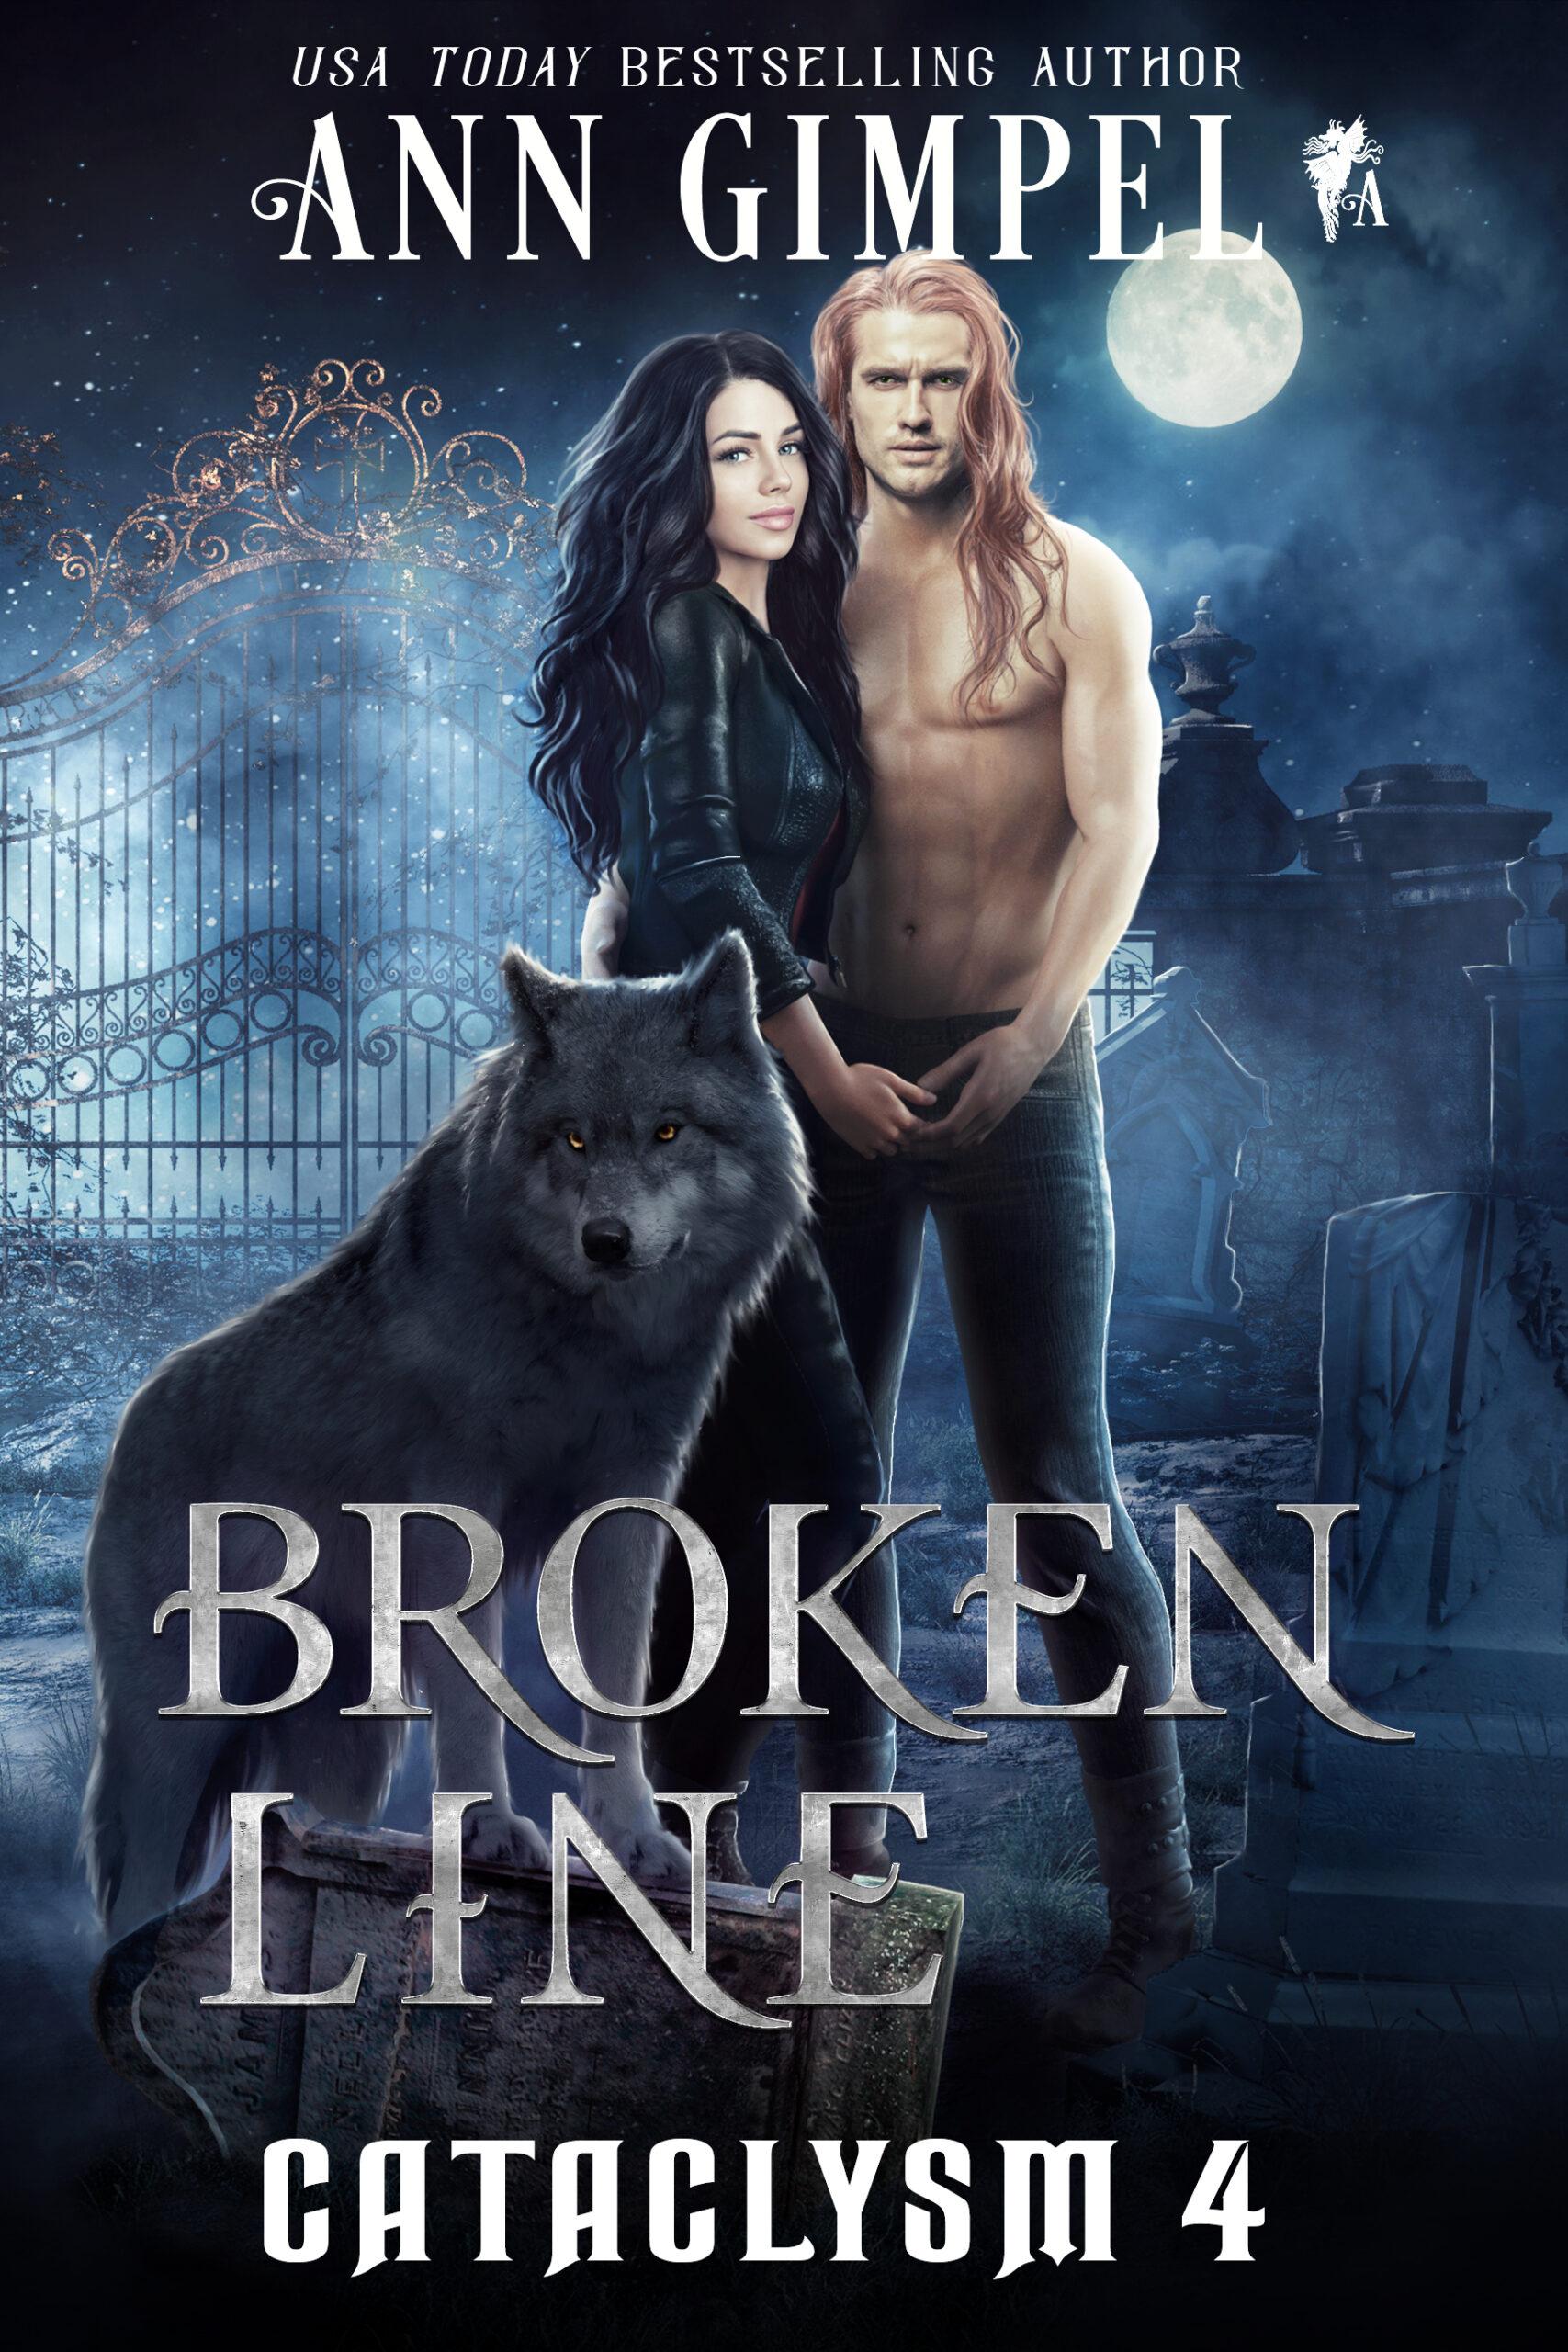 Broken Line, Cataclysm Book Four